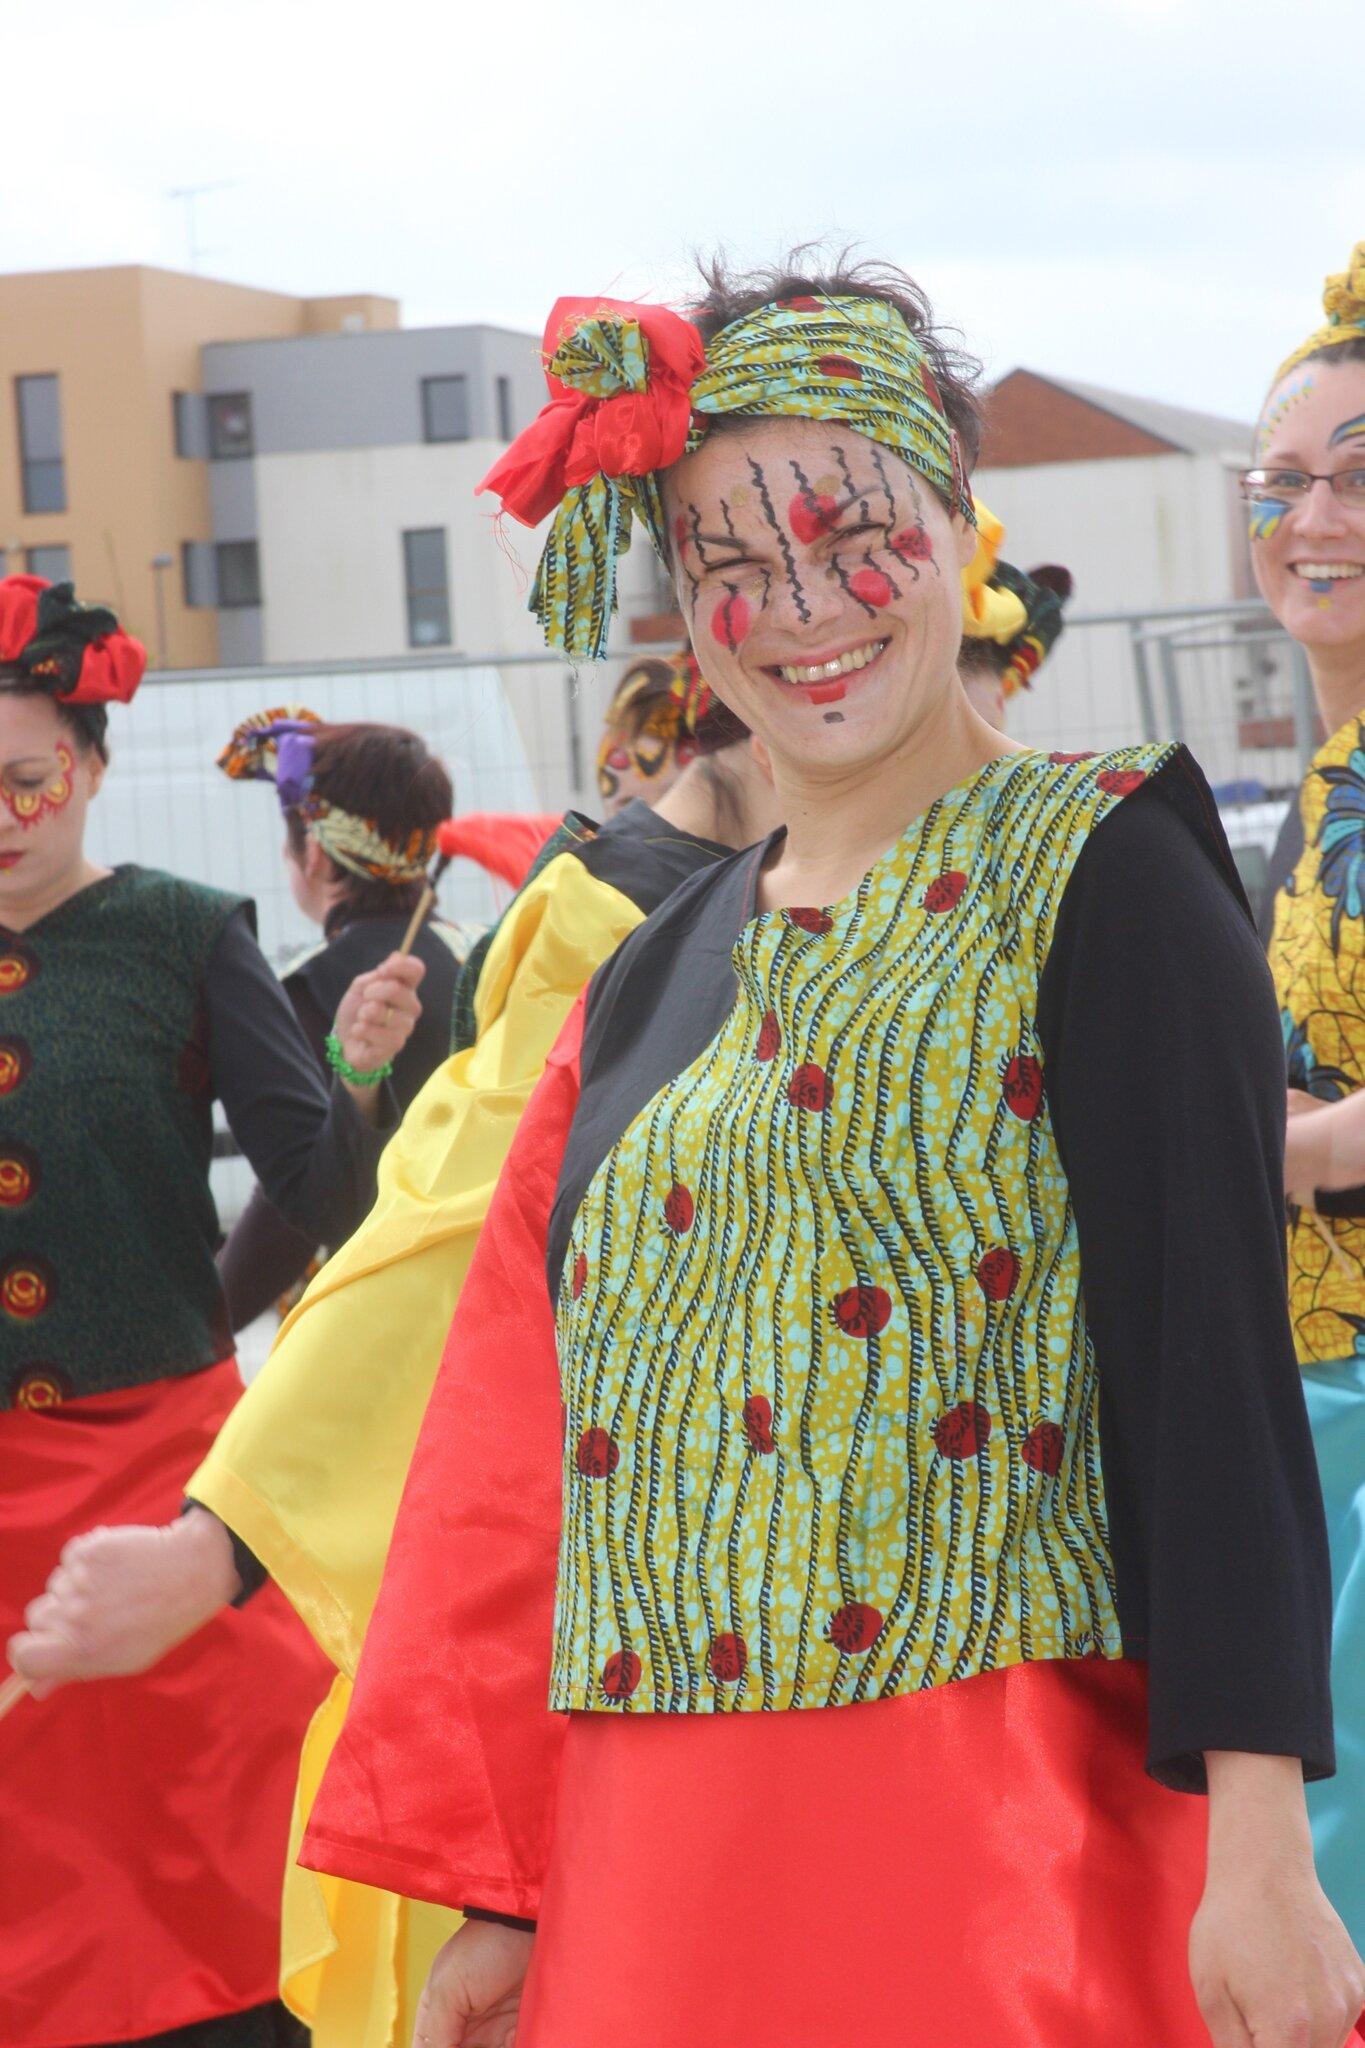 carnaval de landerneau 2014 018